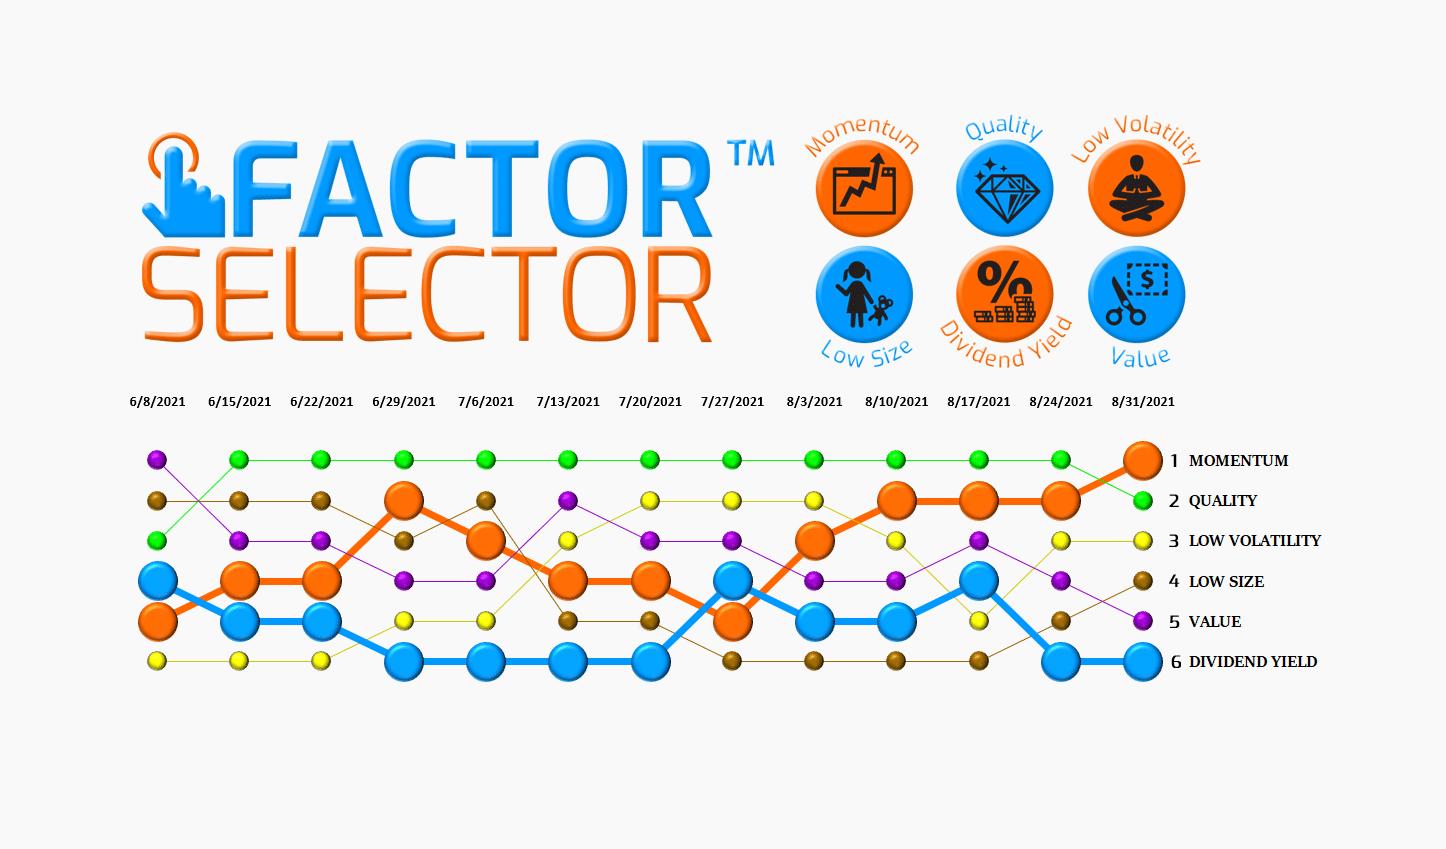 Factor Selector™  – 09/01/21 via @https://www.pinterest.com/market_scholars